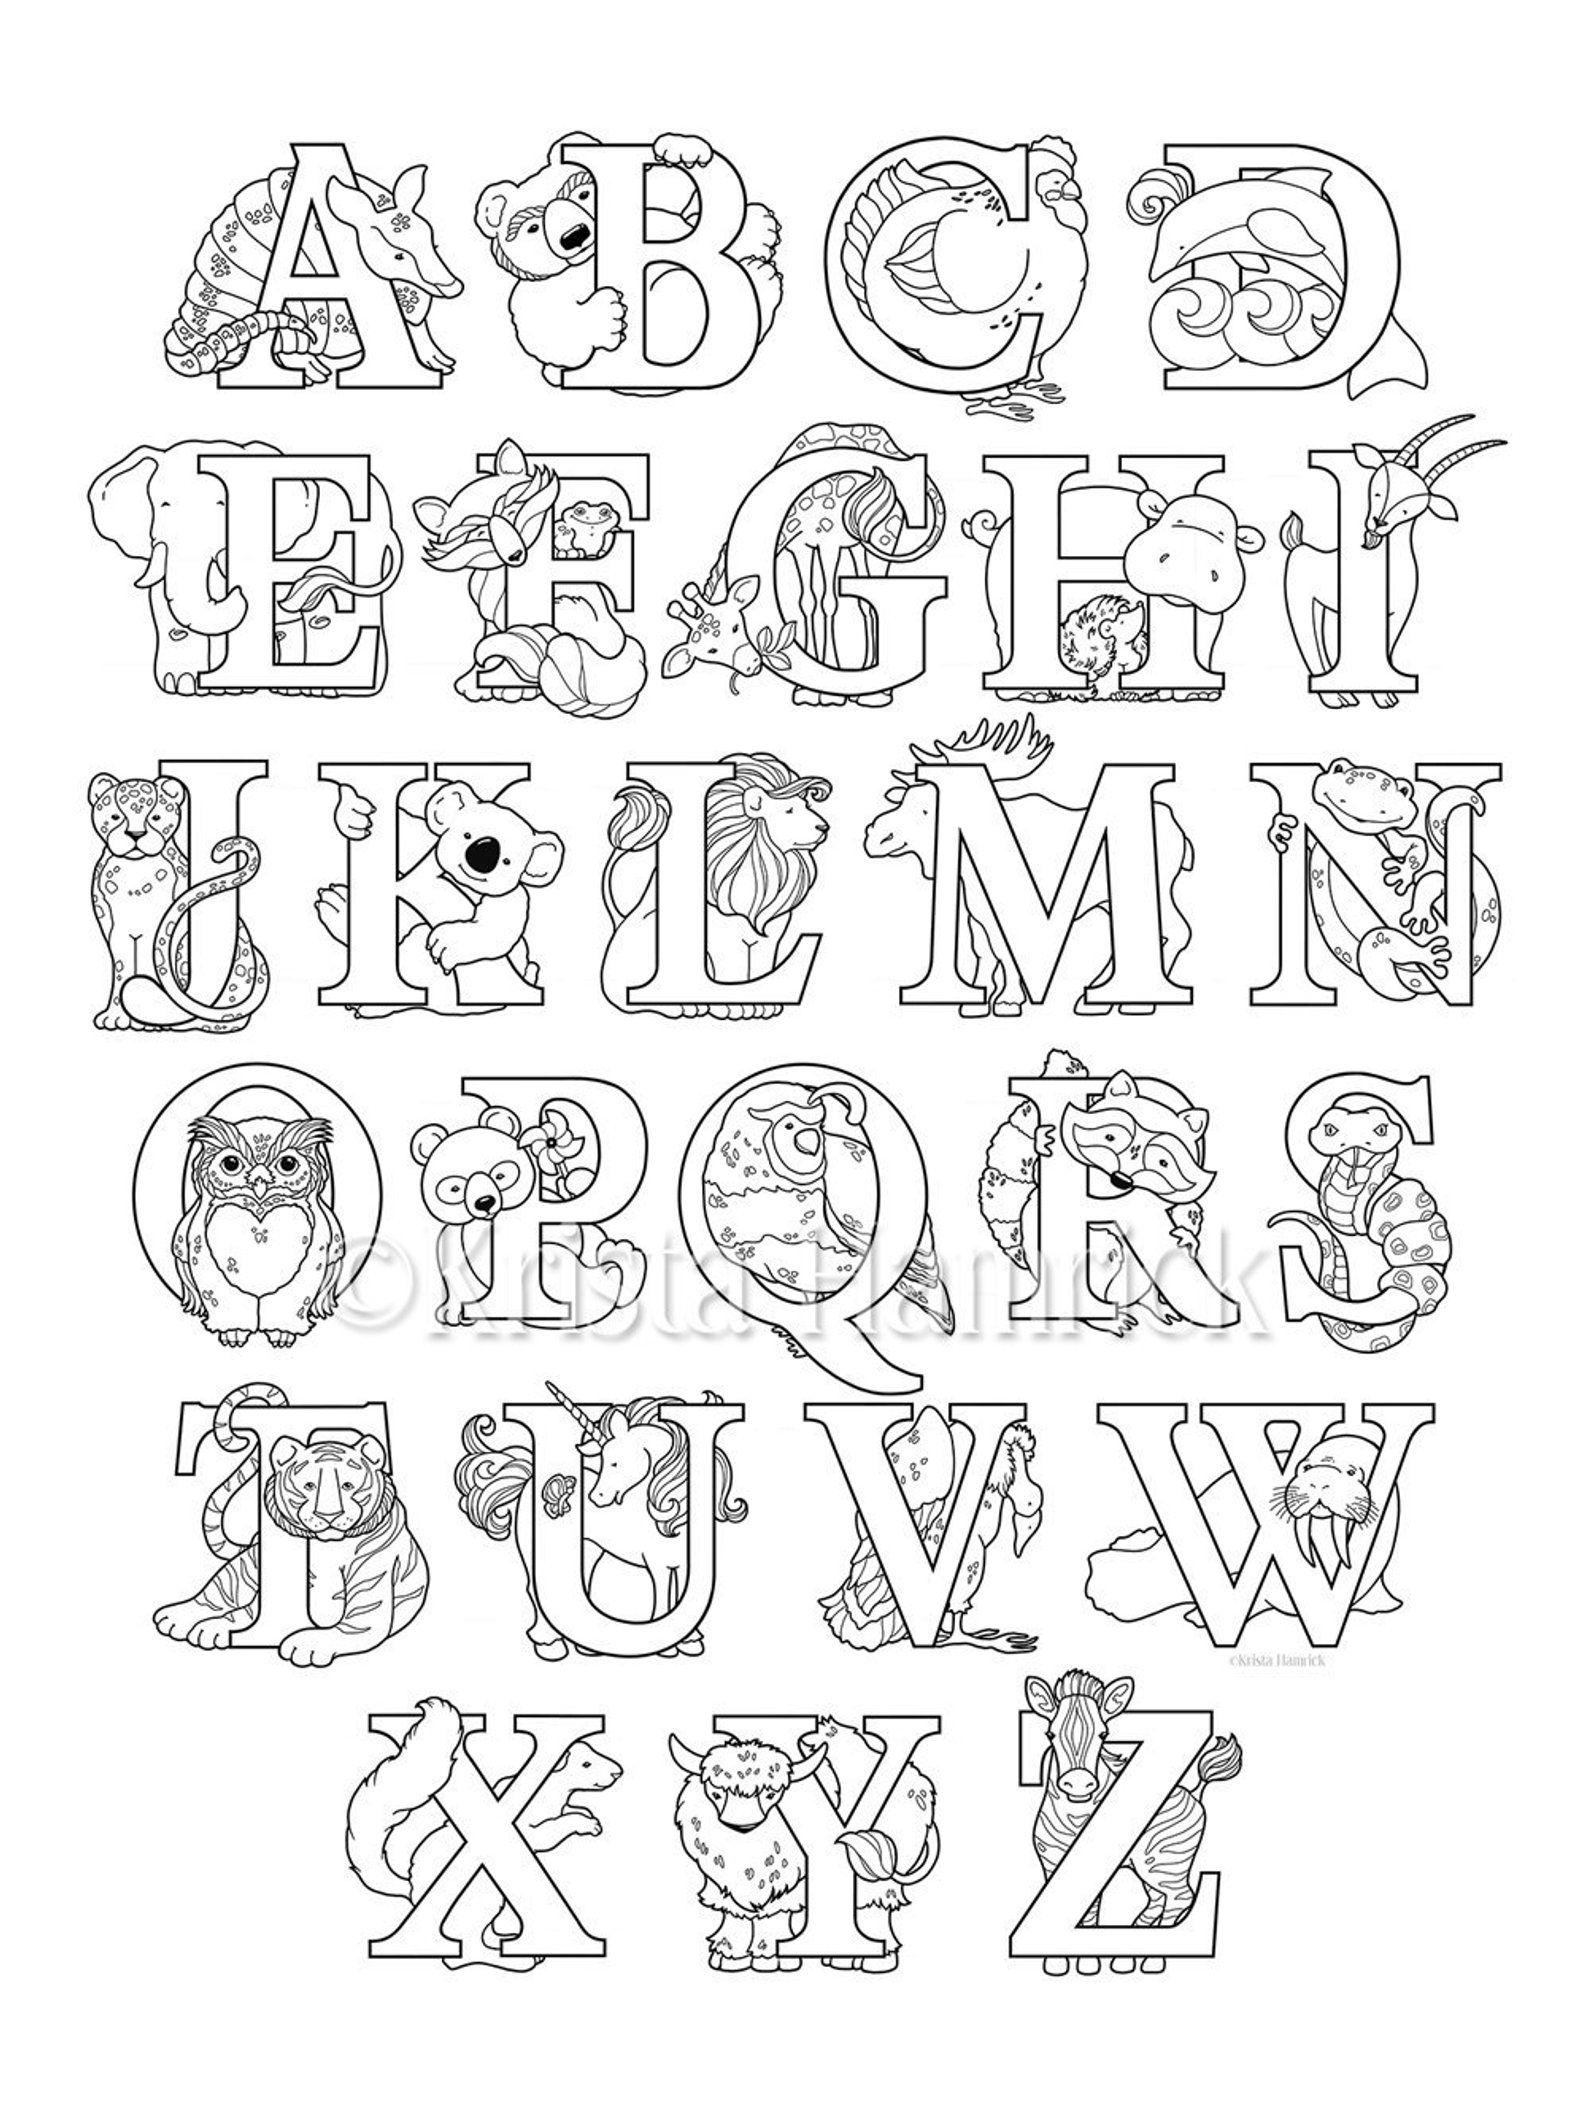 Animal Alphabet Coloring Page 8 5x11 Etsy Alphabet Coloring Pages Abc Coloring Pages Alphabet Coloring